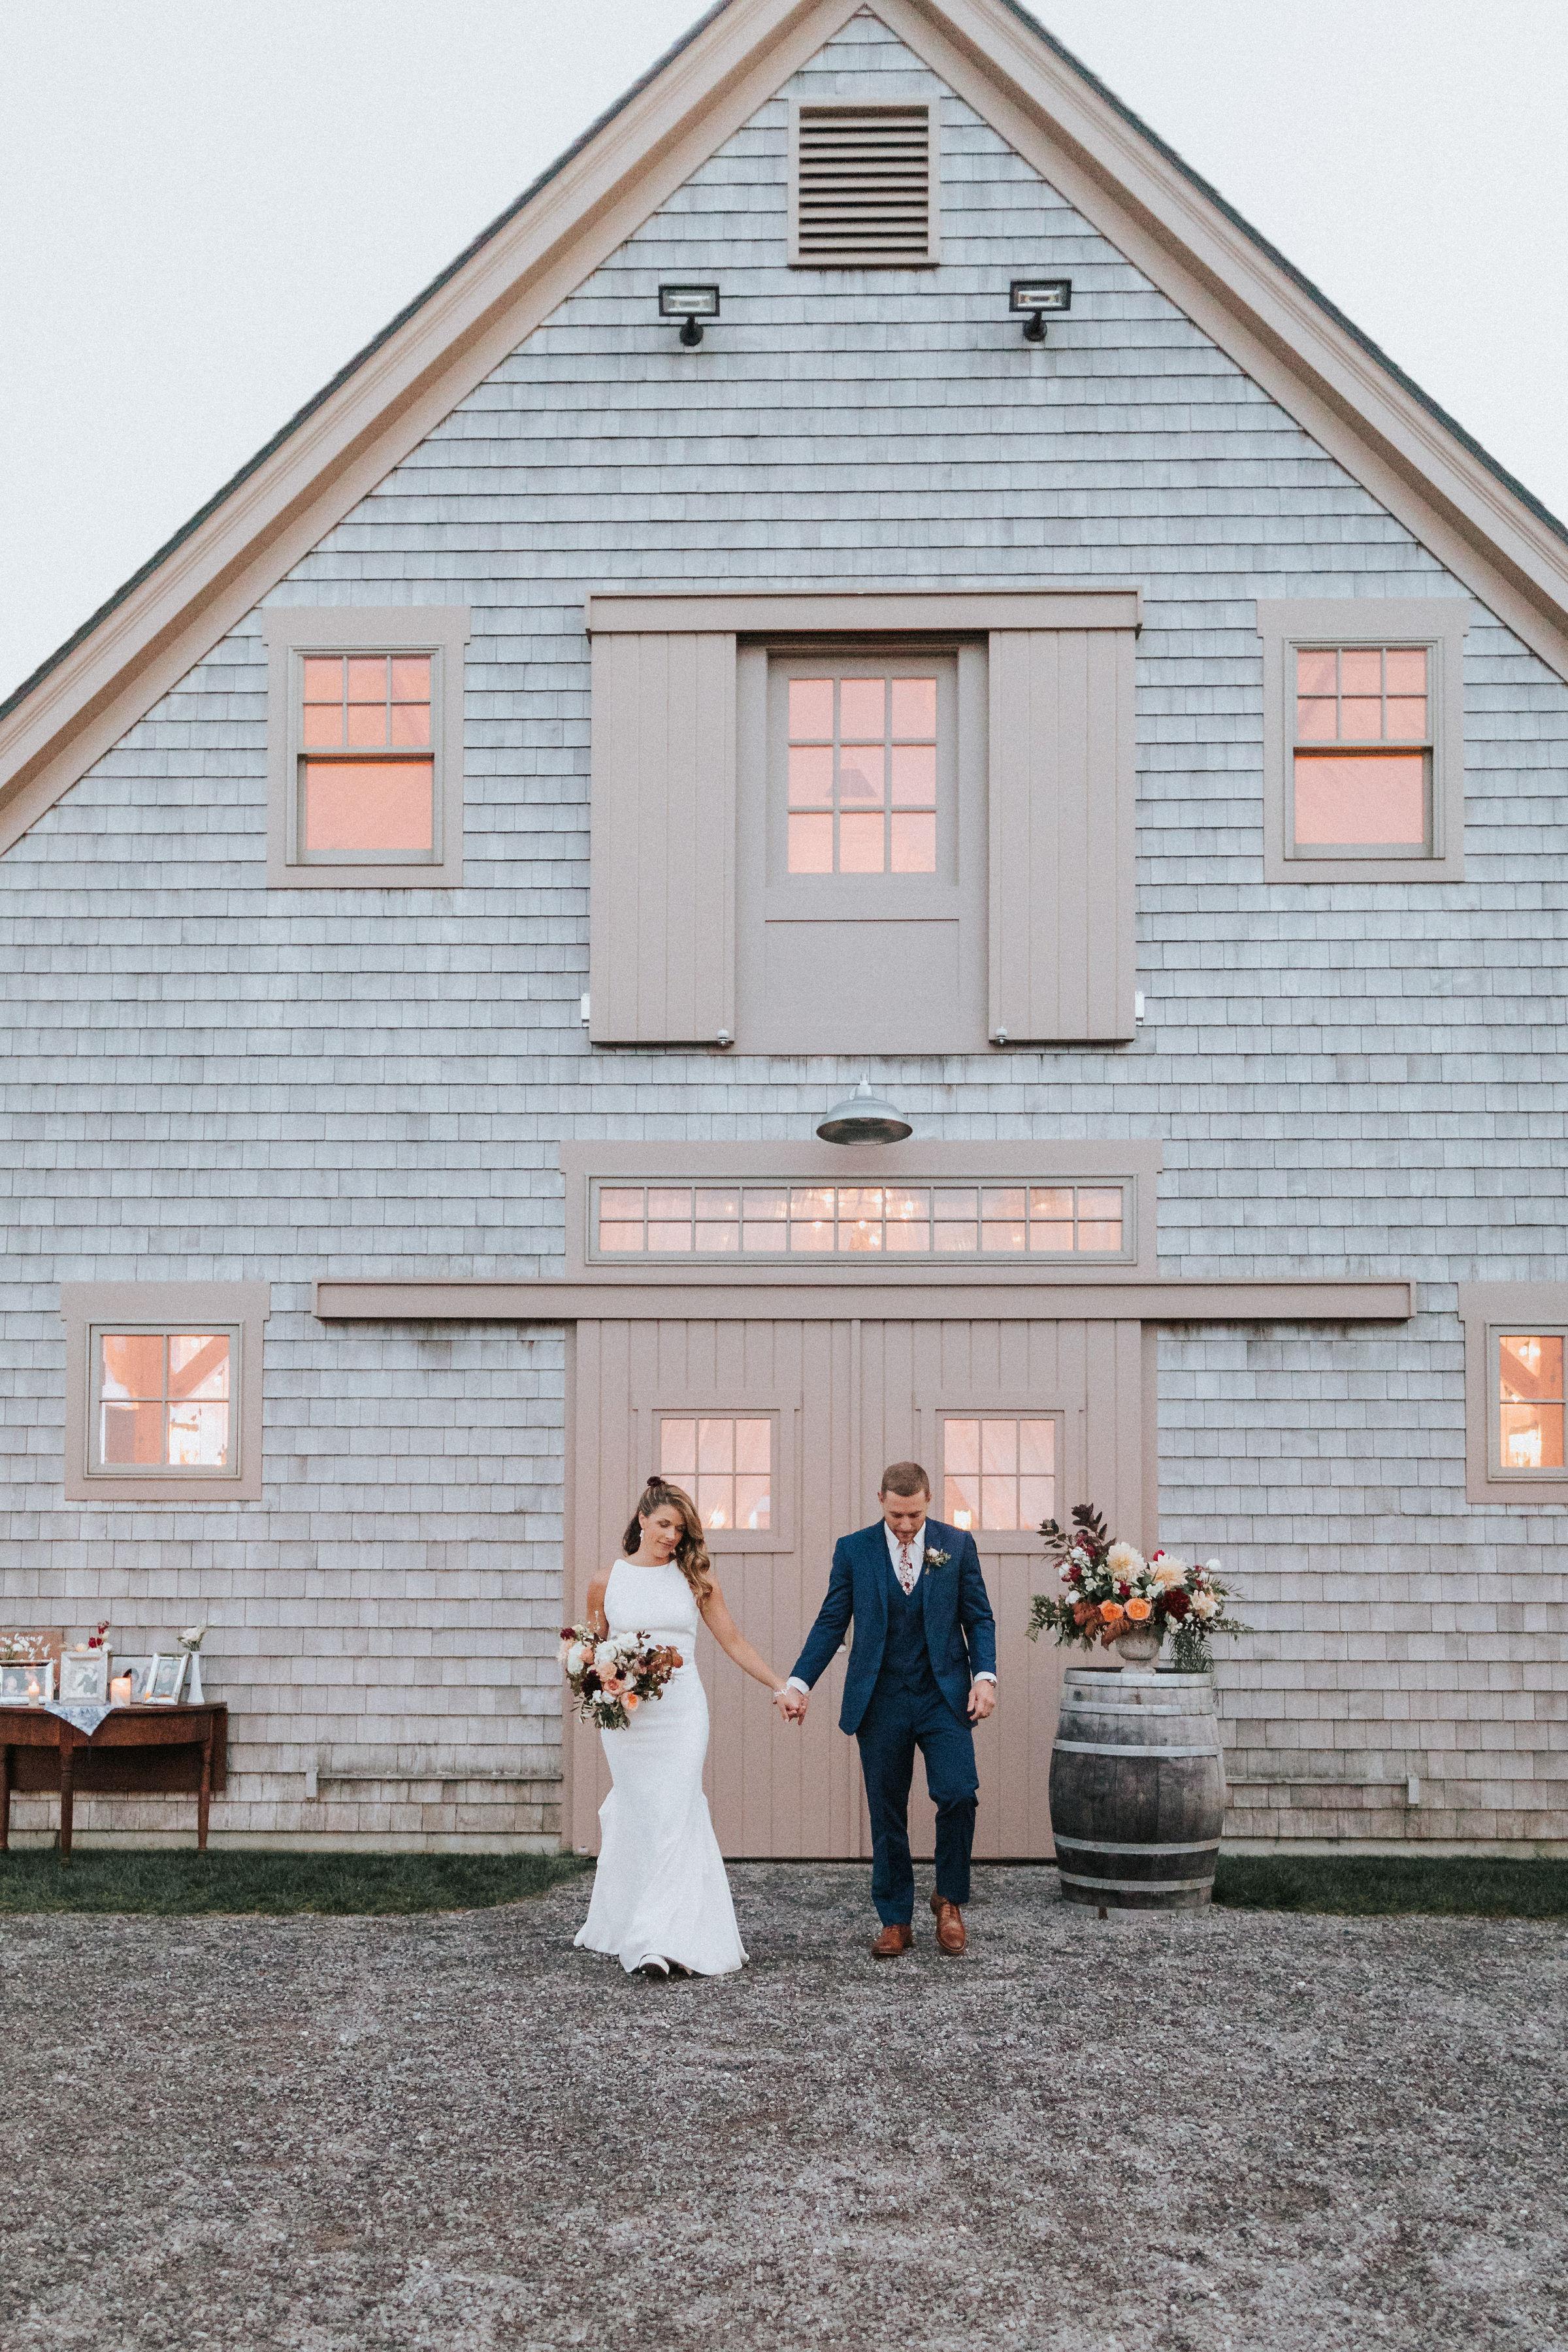 Allie_Greg_Beech_Hill_Barn_Wedding_Dinner-276.jpg